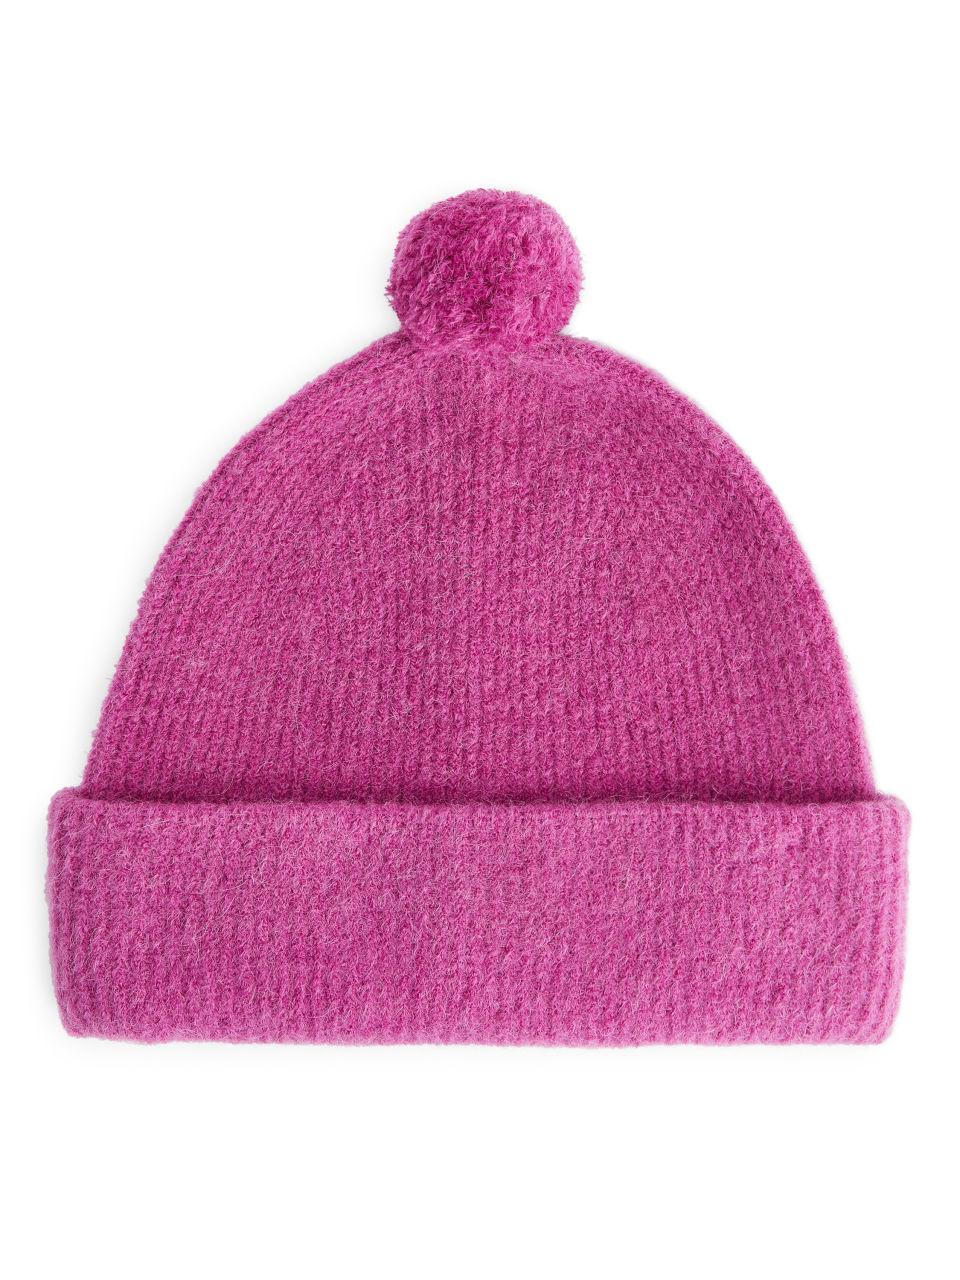 Alpaca Merino Pompom Beanie - Pink